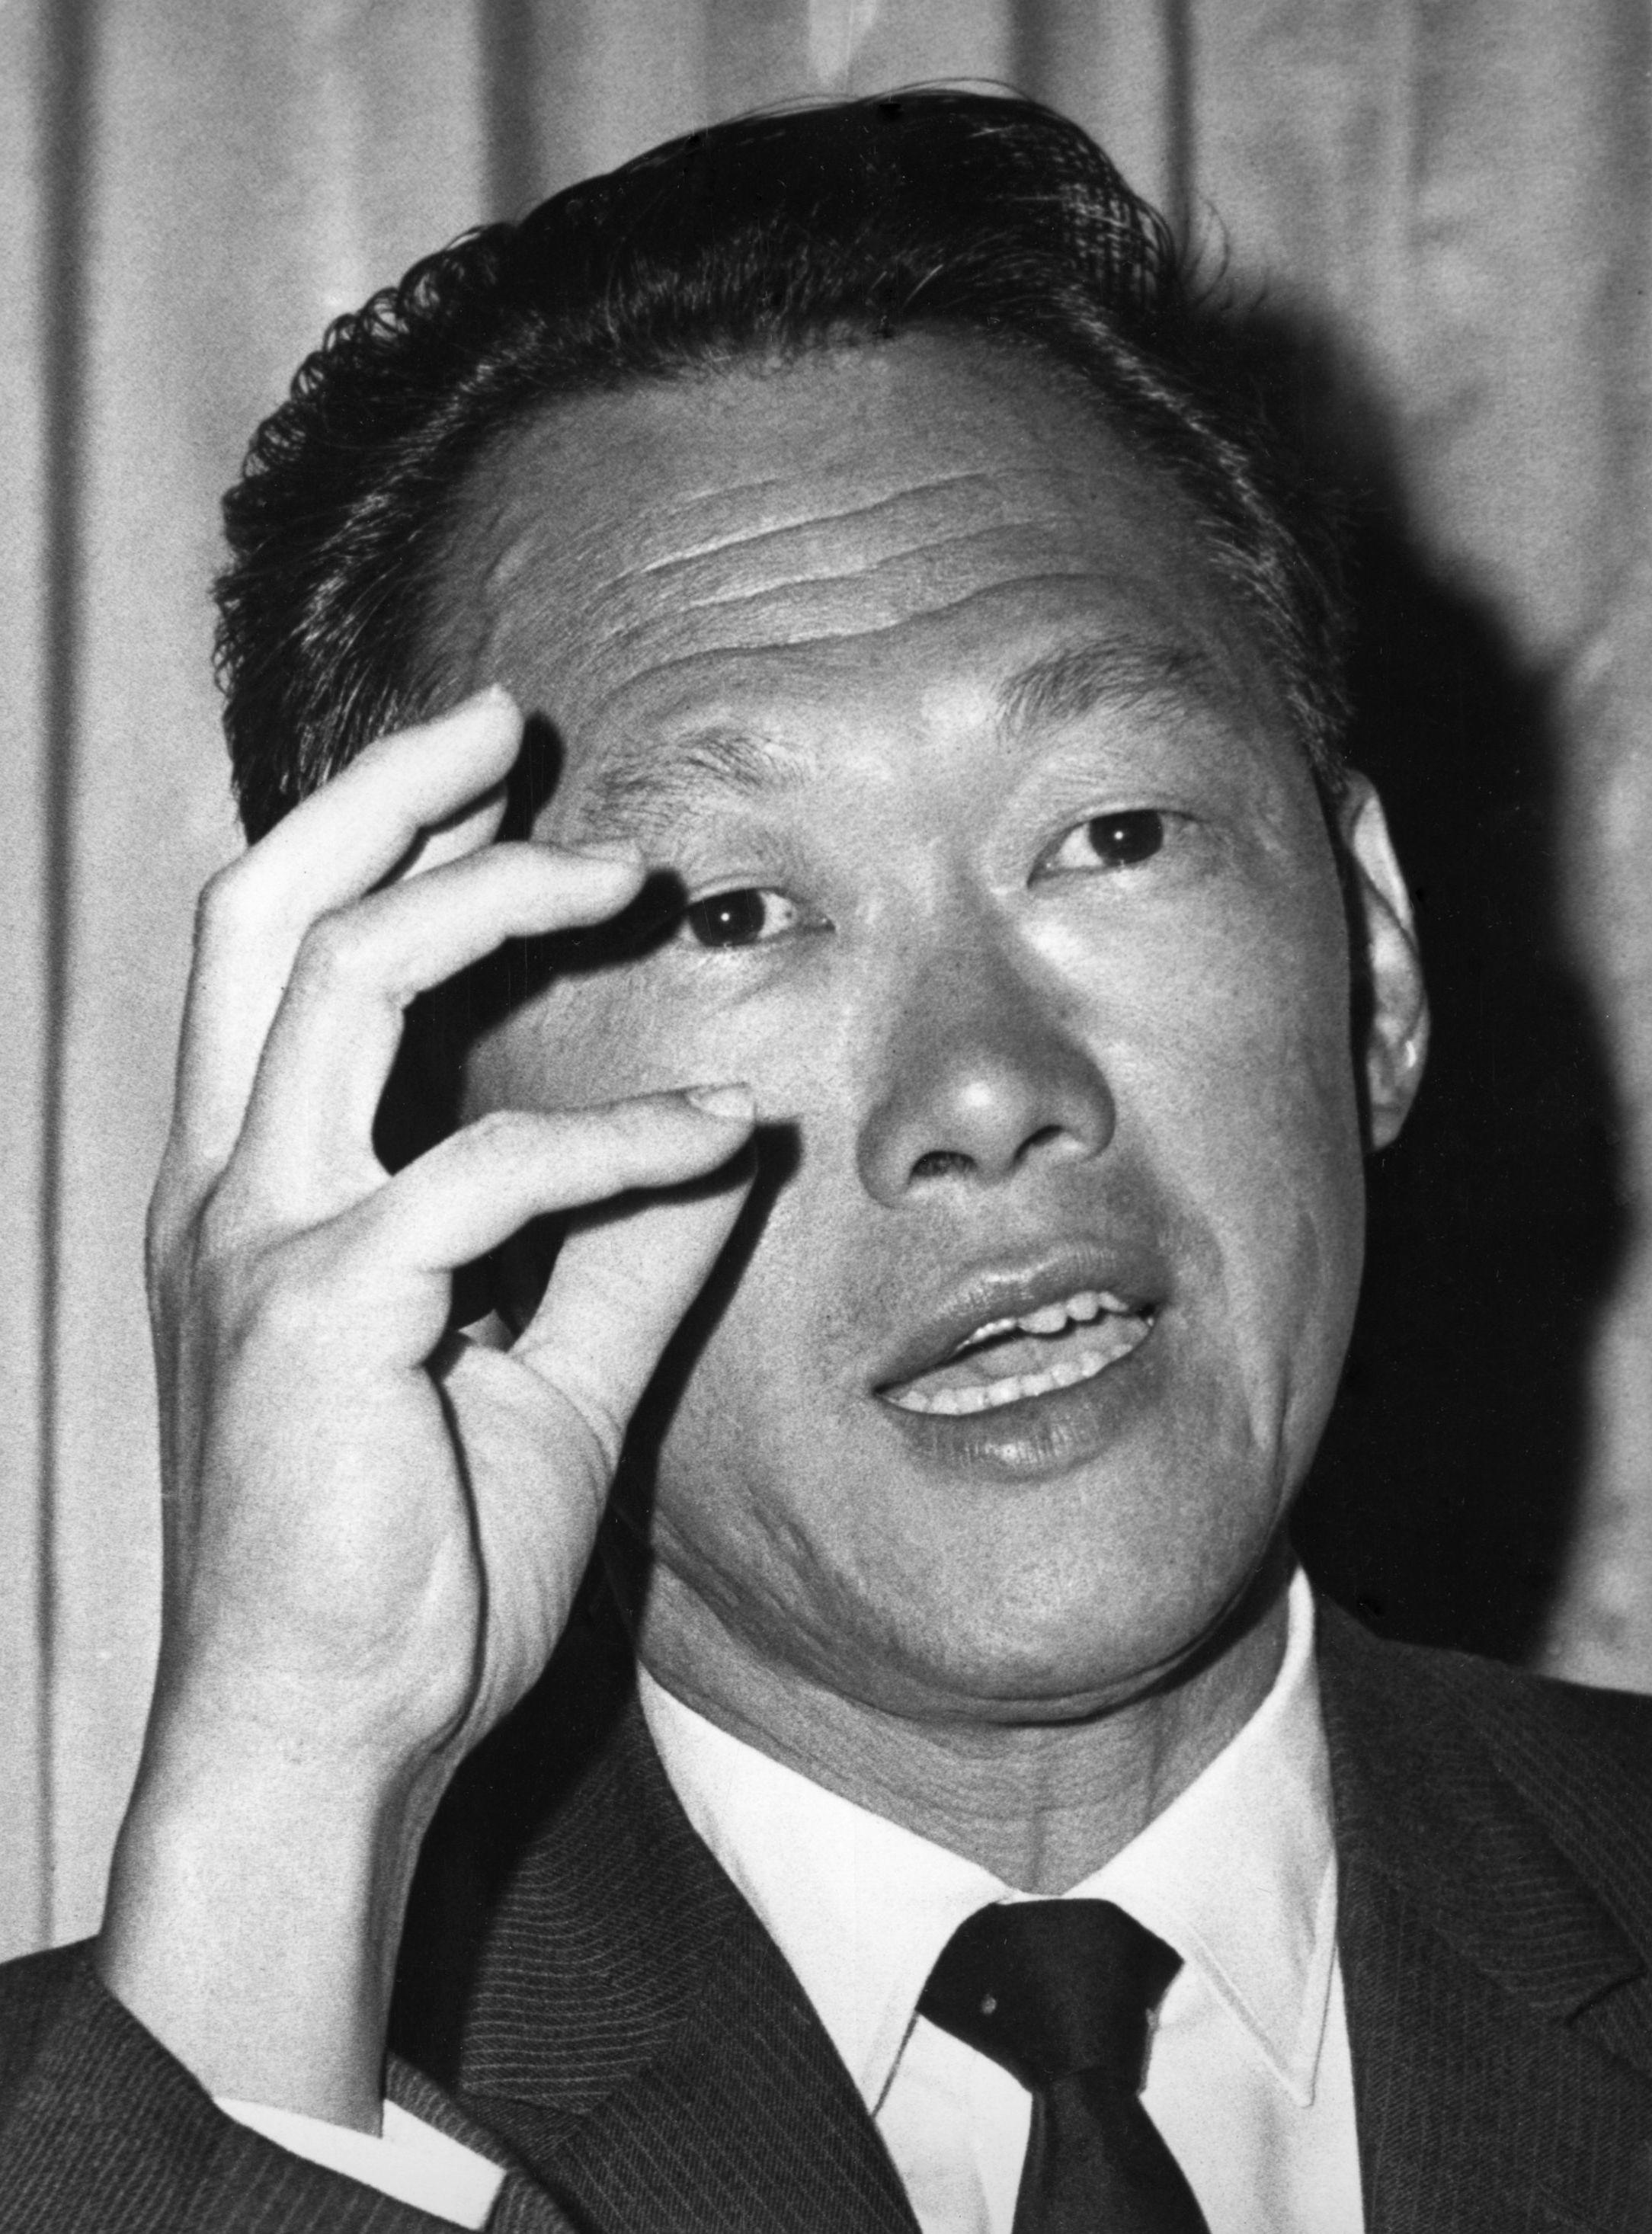 Singapore-LKY-Lee Kuan Yew